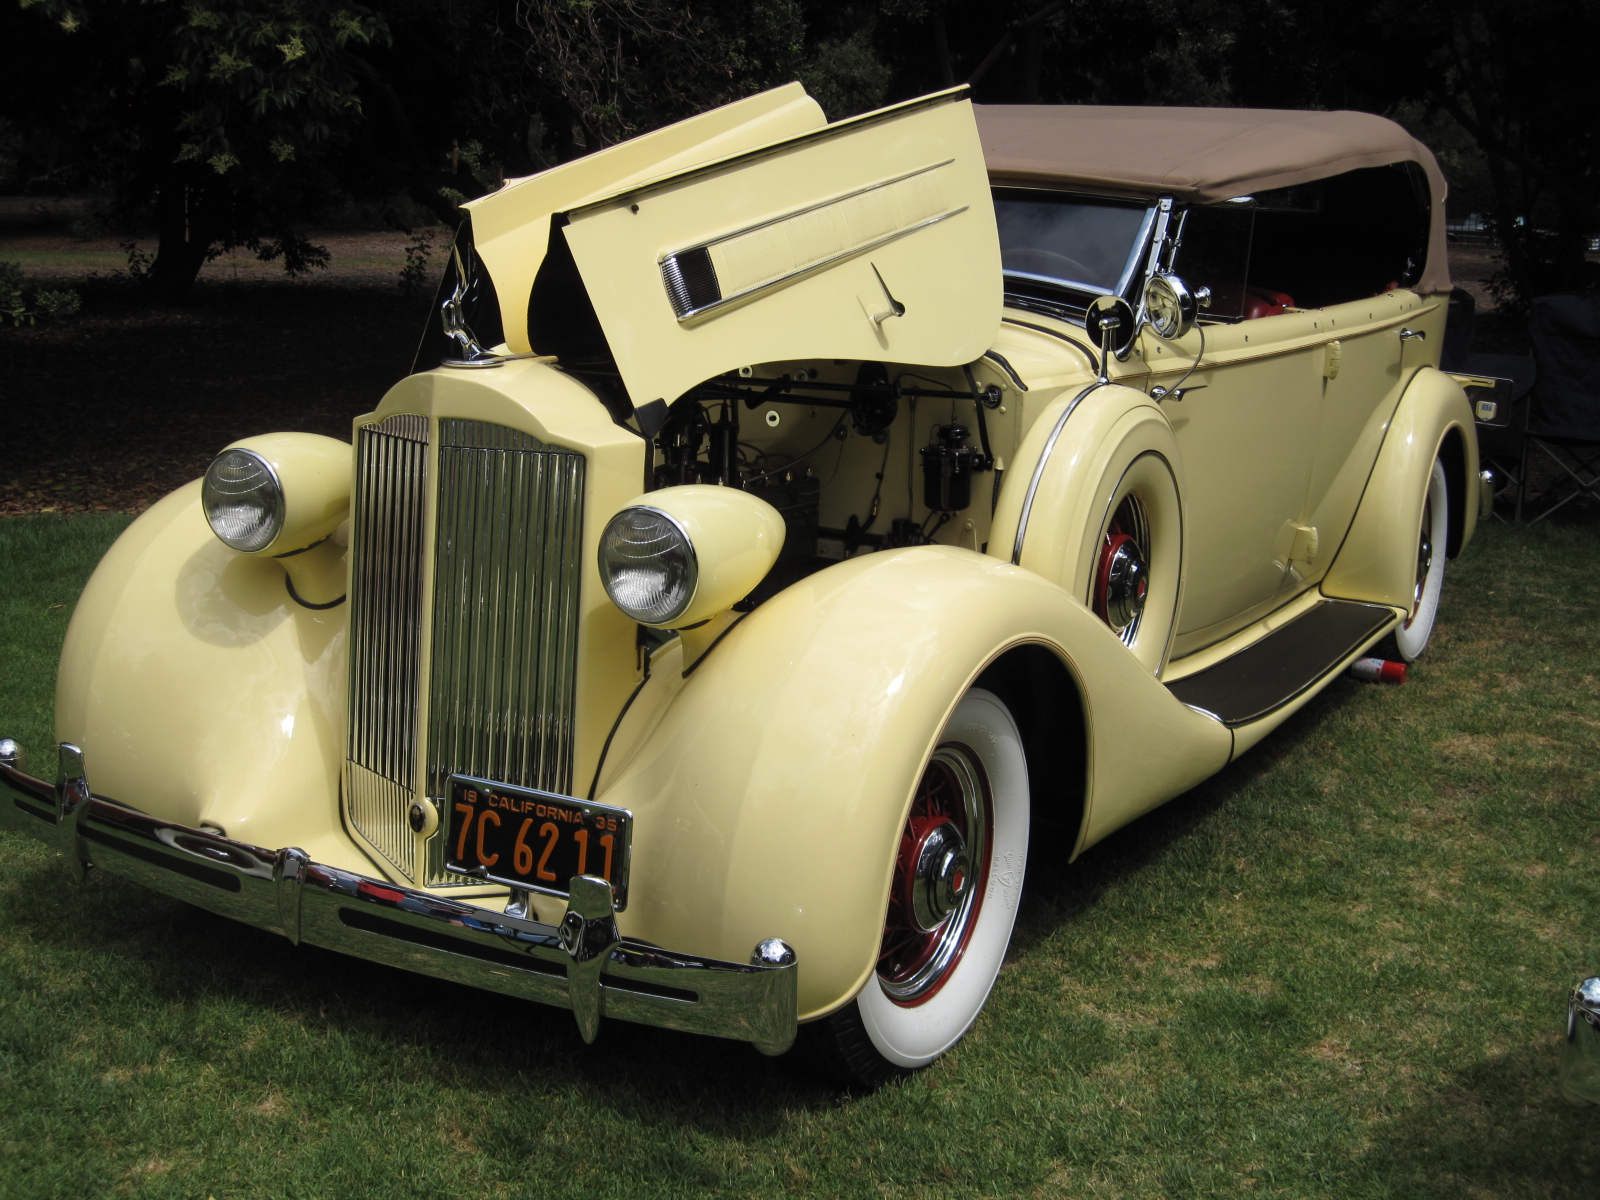 1935 Packard 1201 Phaeton Andy Spiklomen.JPG